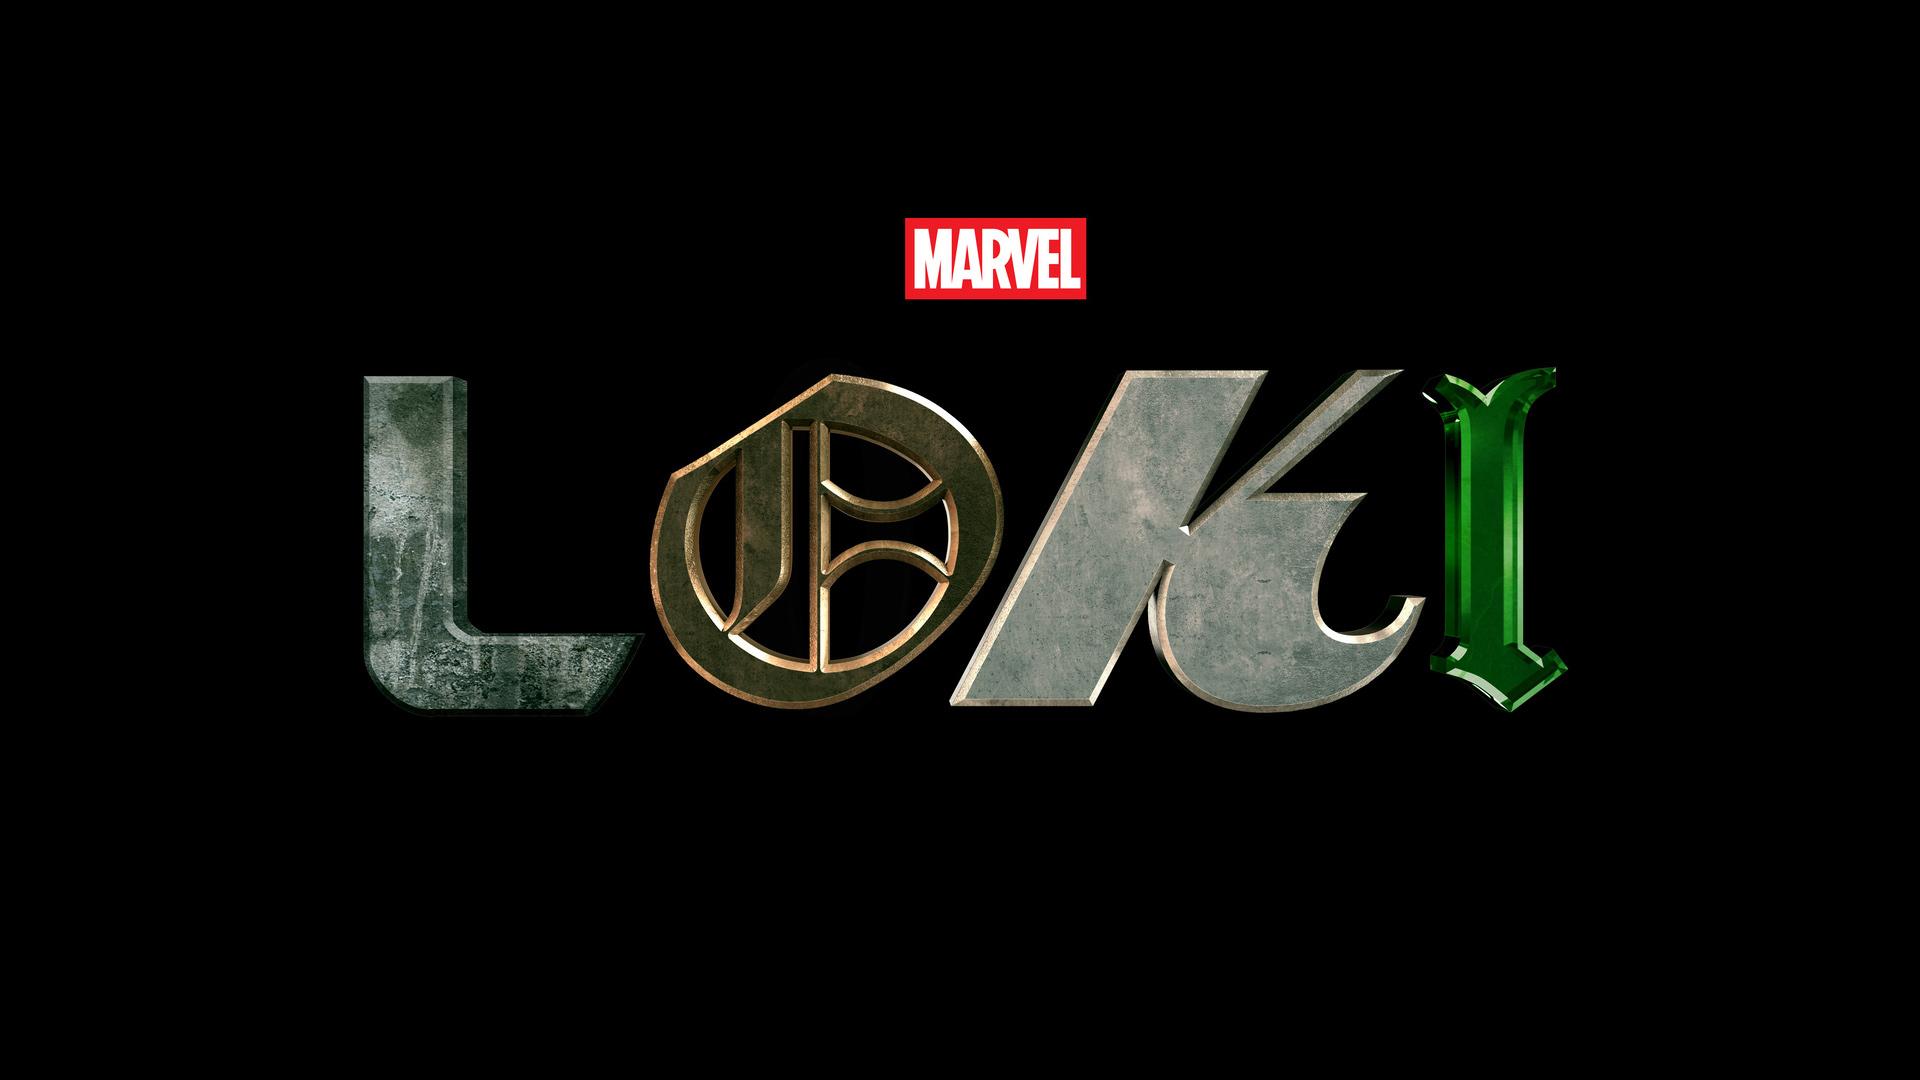 Rol voor Gugu Mbatha-Raw in Marvel's Loki